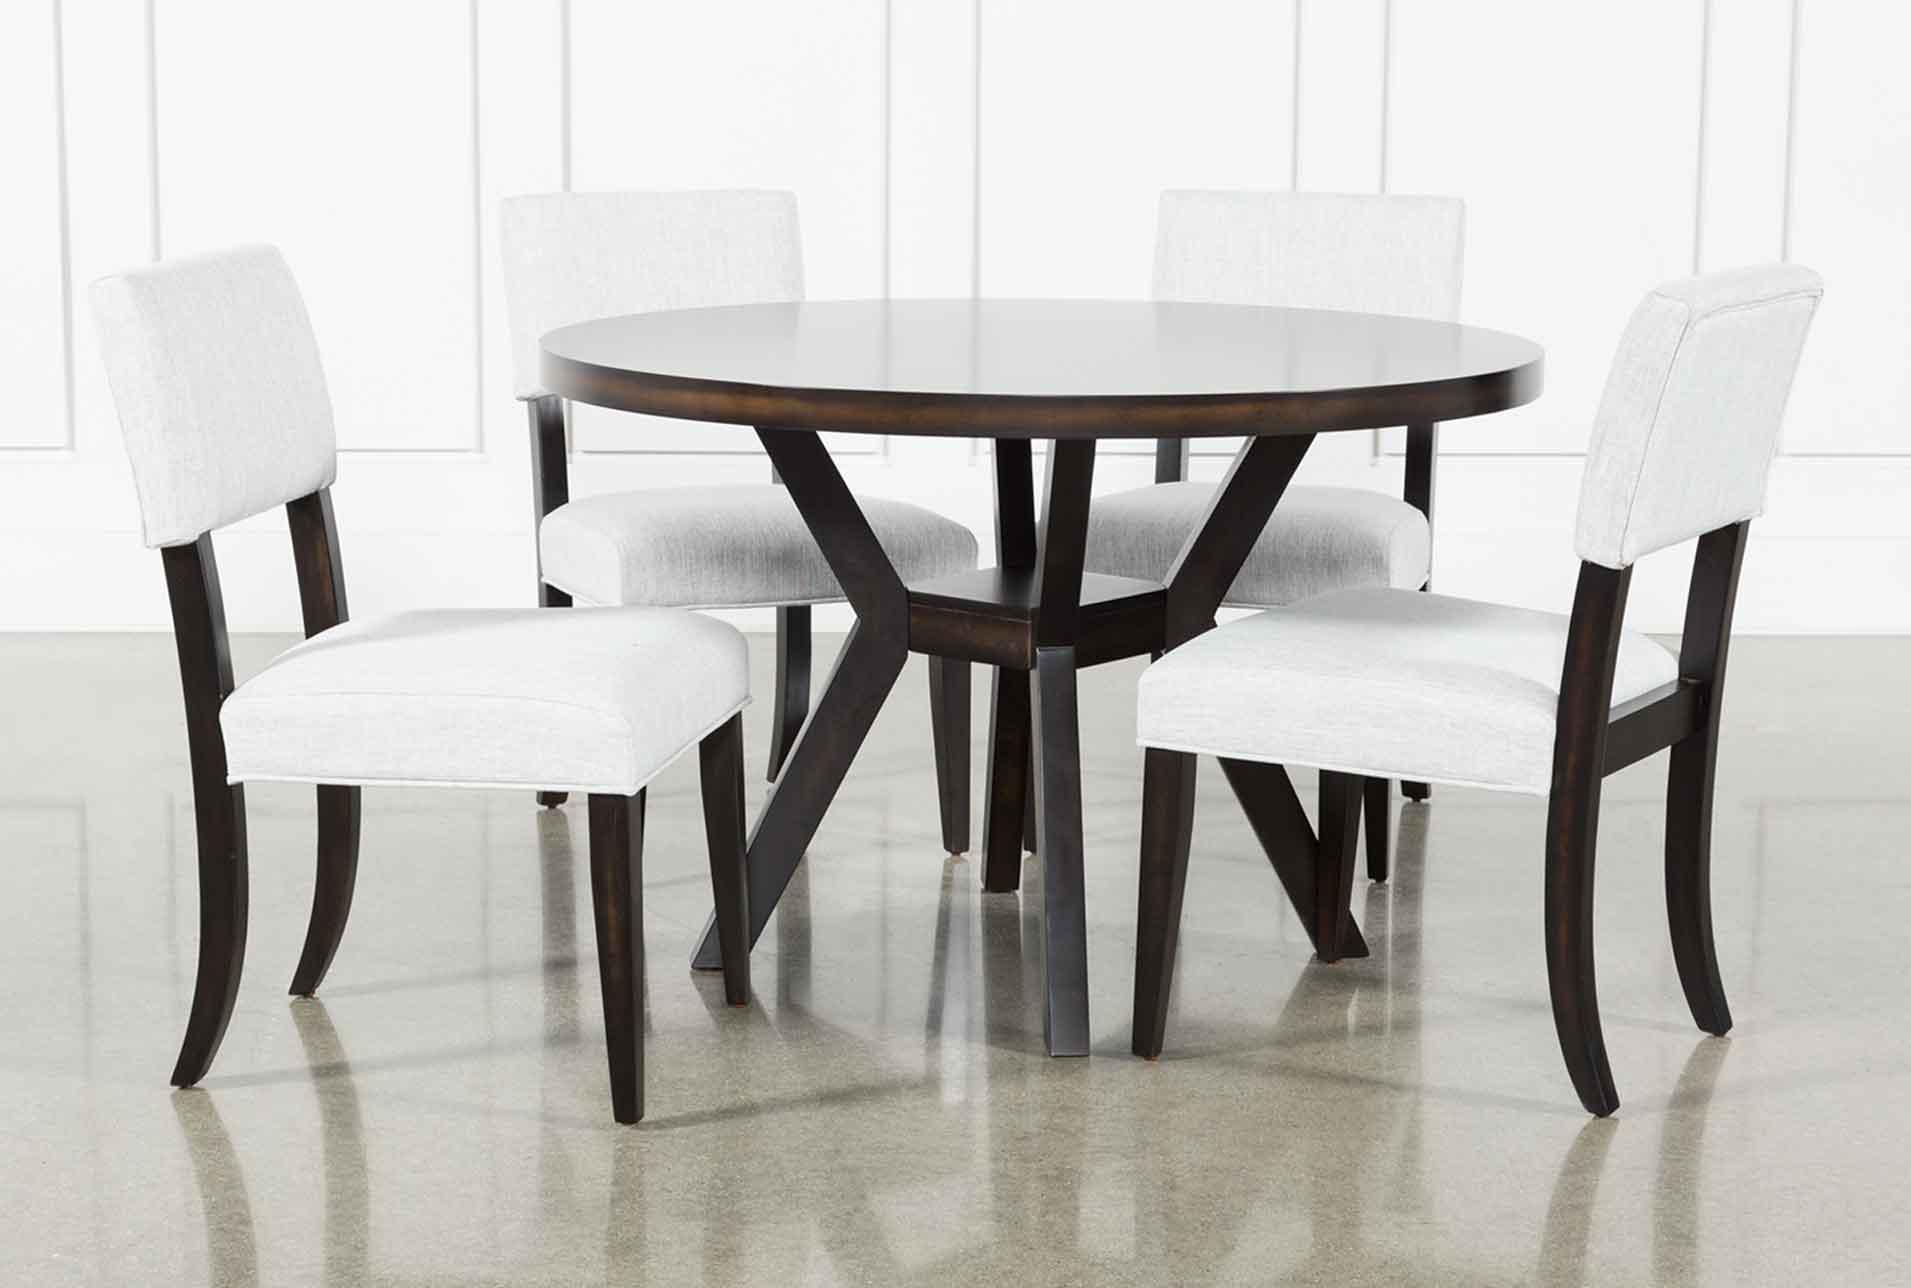 & Macie Black 5 Piece Dining Set | Living Spaces